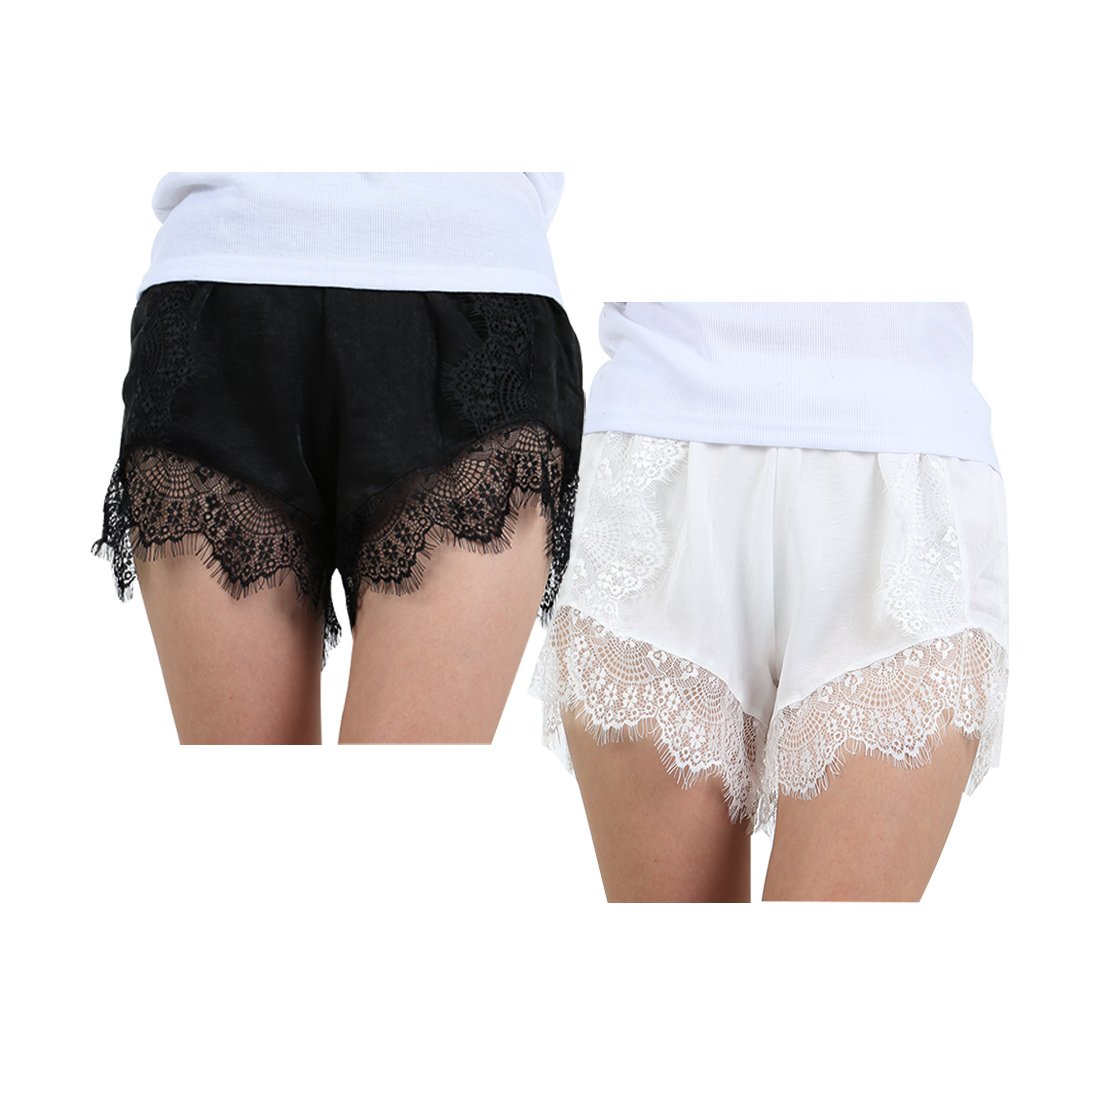 uxcell Women 2 Pack Eyelash Lace Silky Shorts Casual Summer Shorts